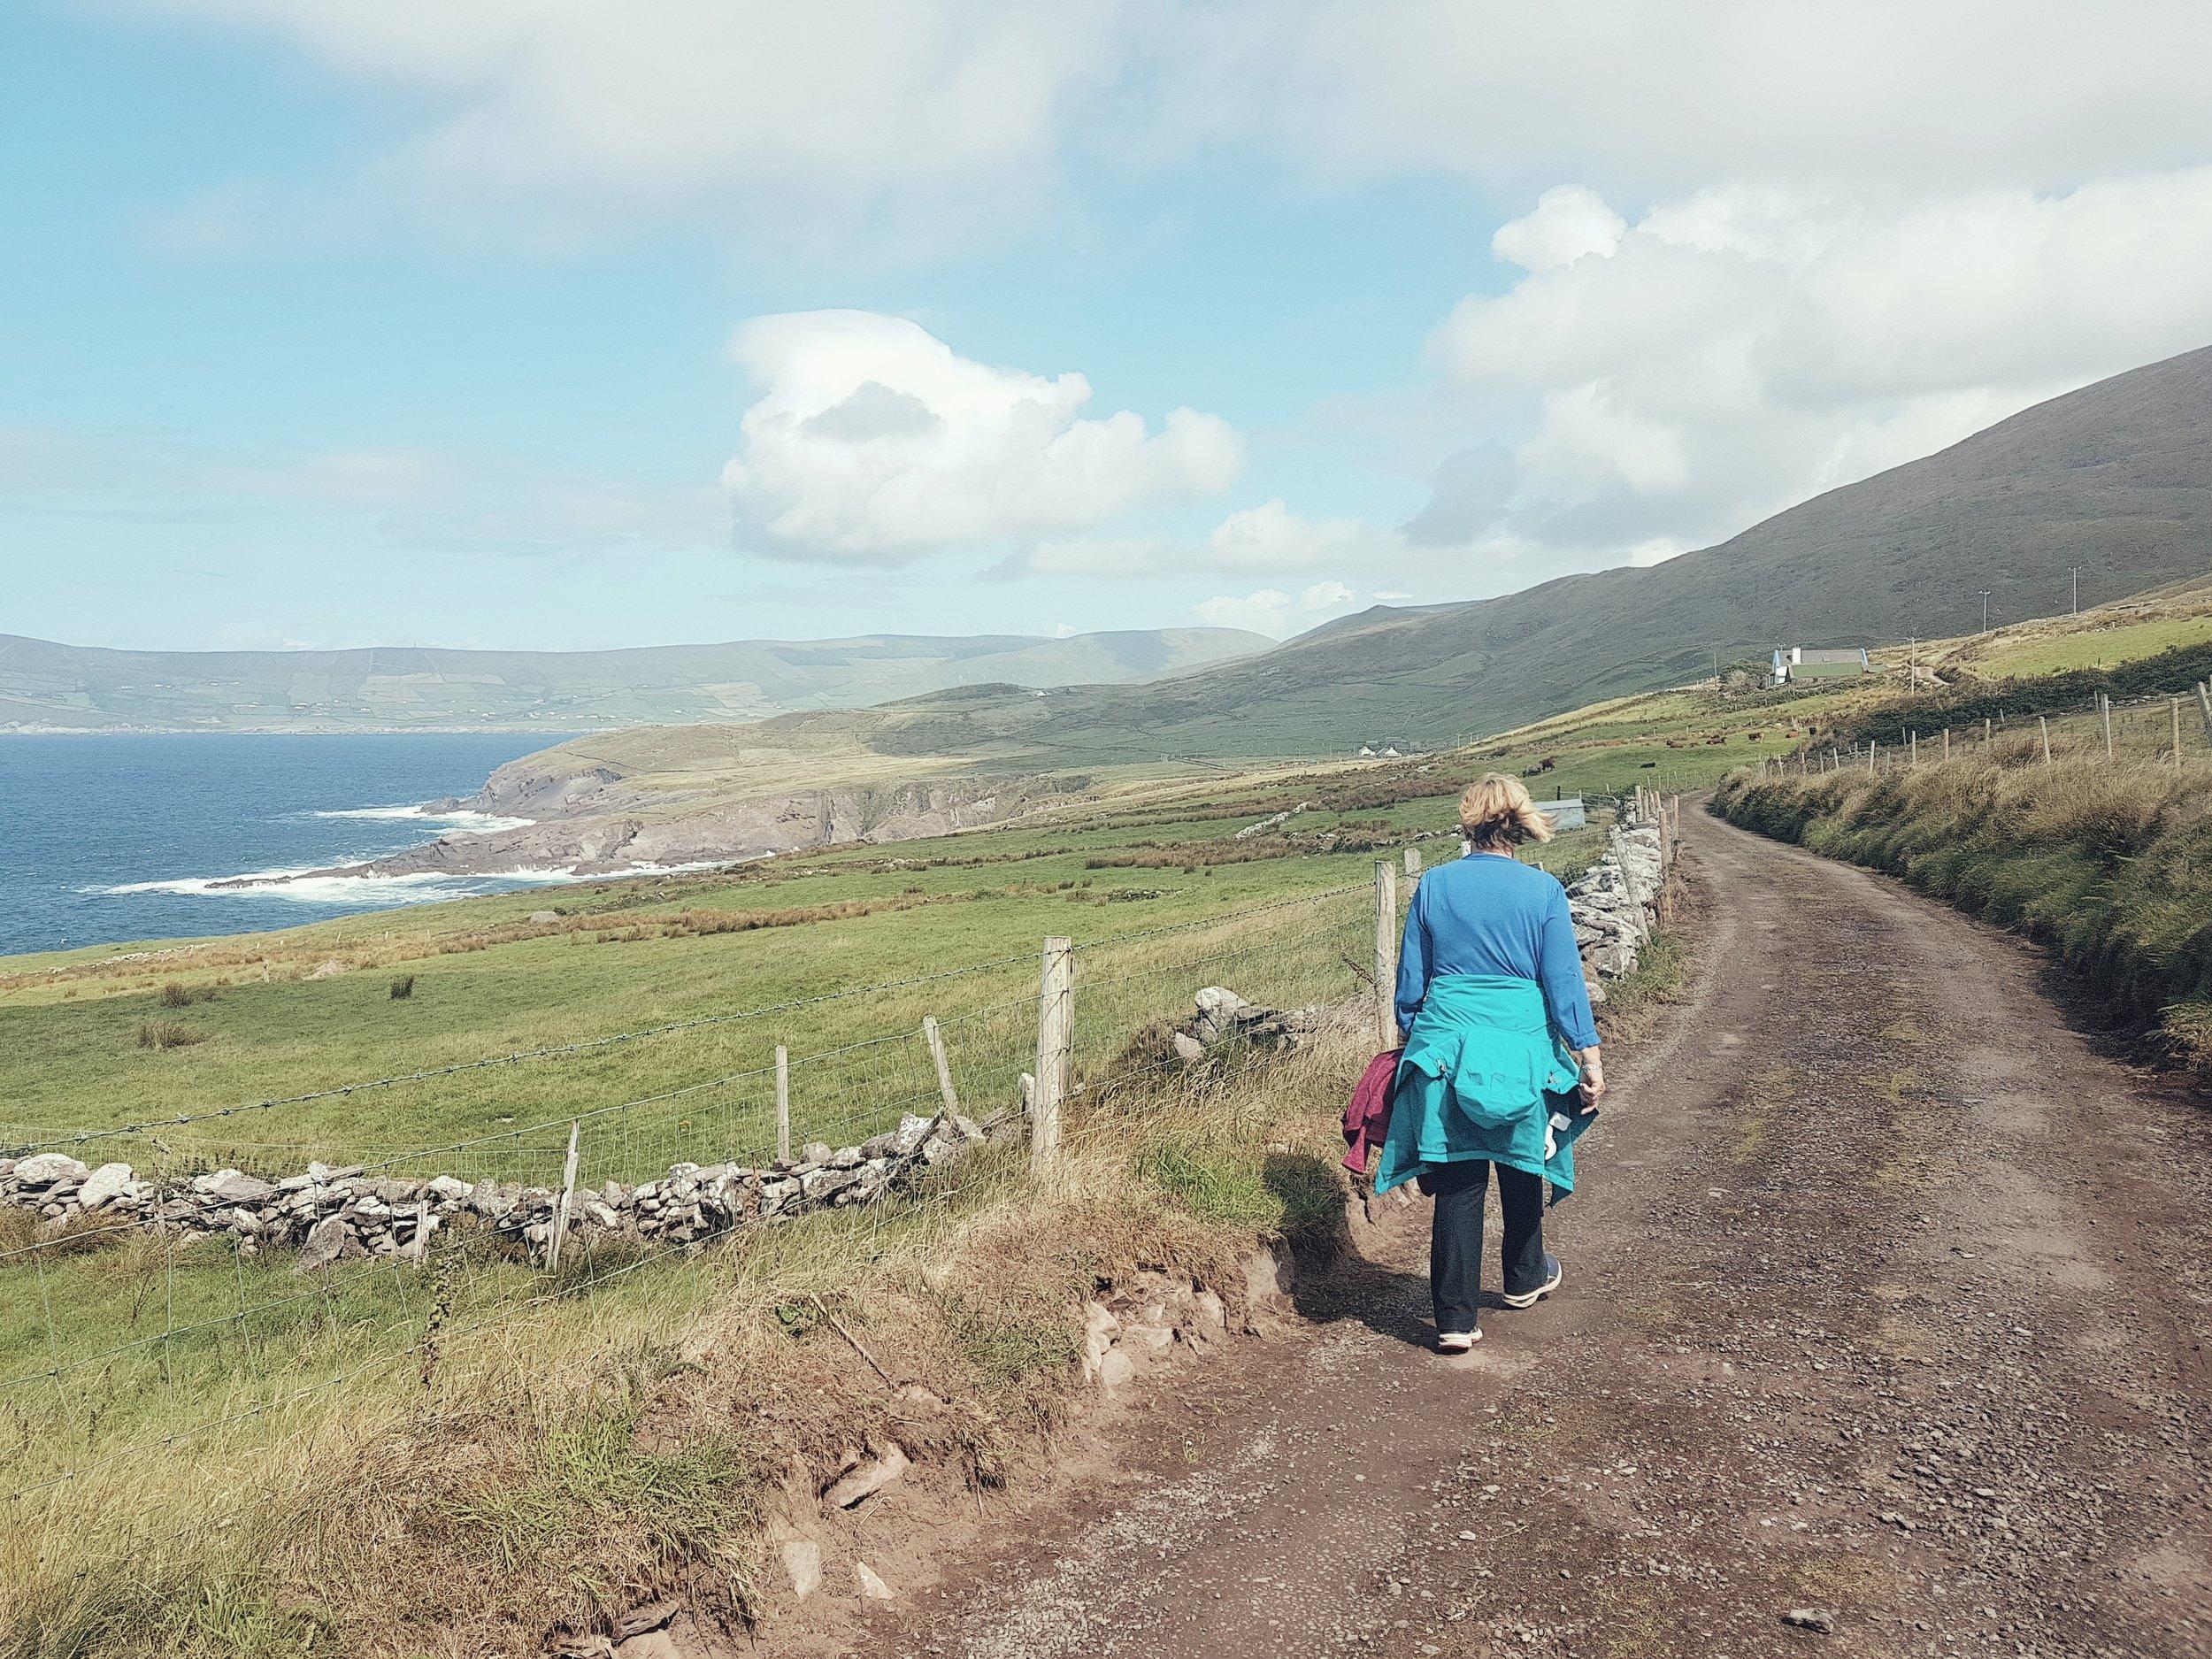 Ireland. Wild Atlantic Way. Kerry. Counthy Kerry. Travel photography. Landscape photography. Blog. Irish. Travelling Ireland. Ireland west coast. Wild Landscape. Trip. Vacation.  (17).jpg